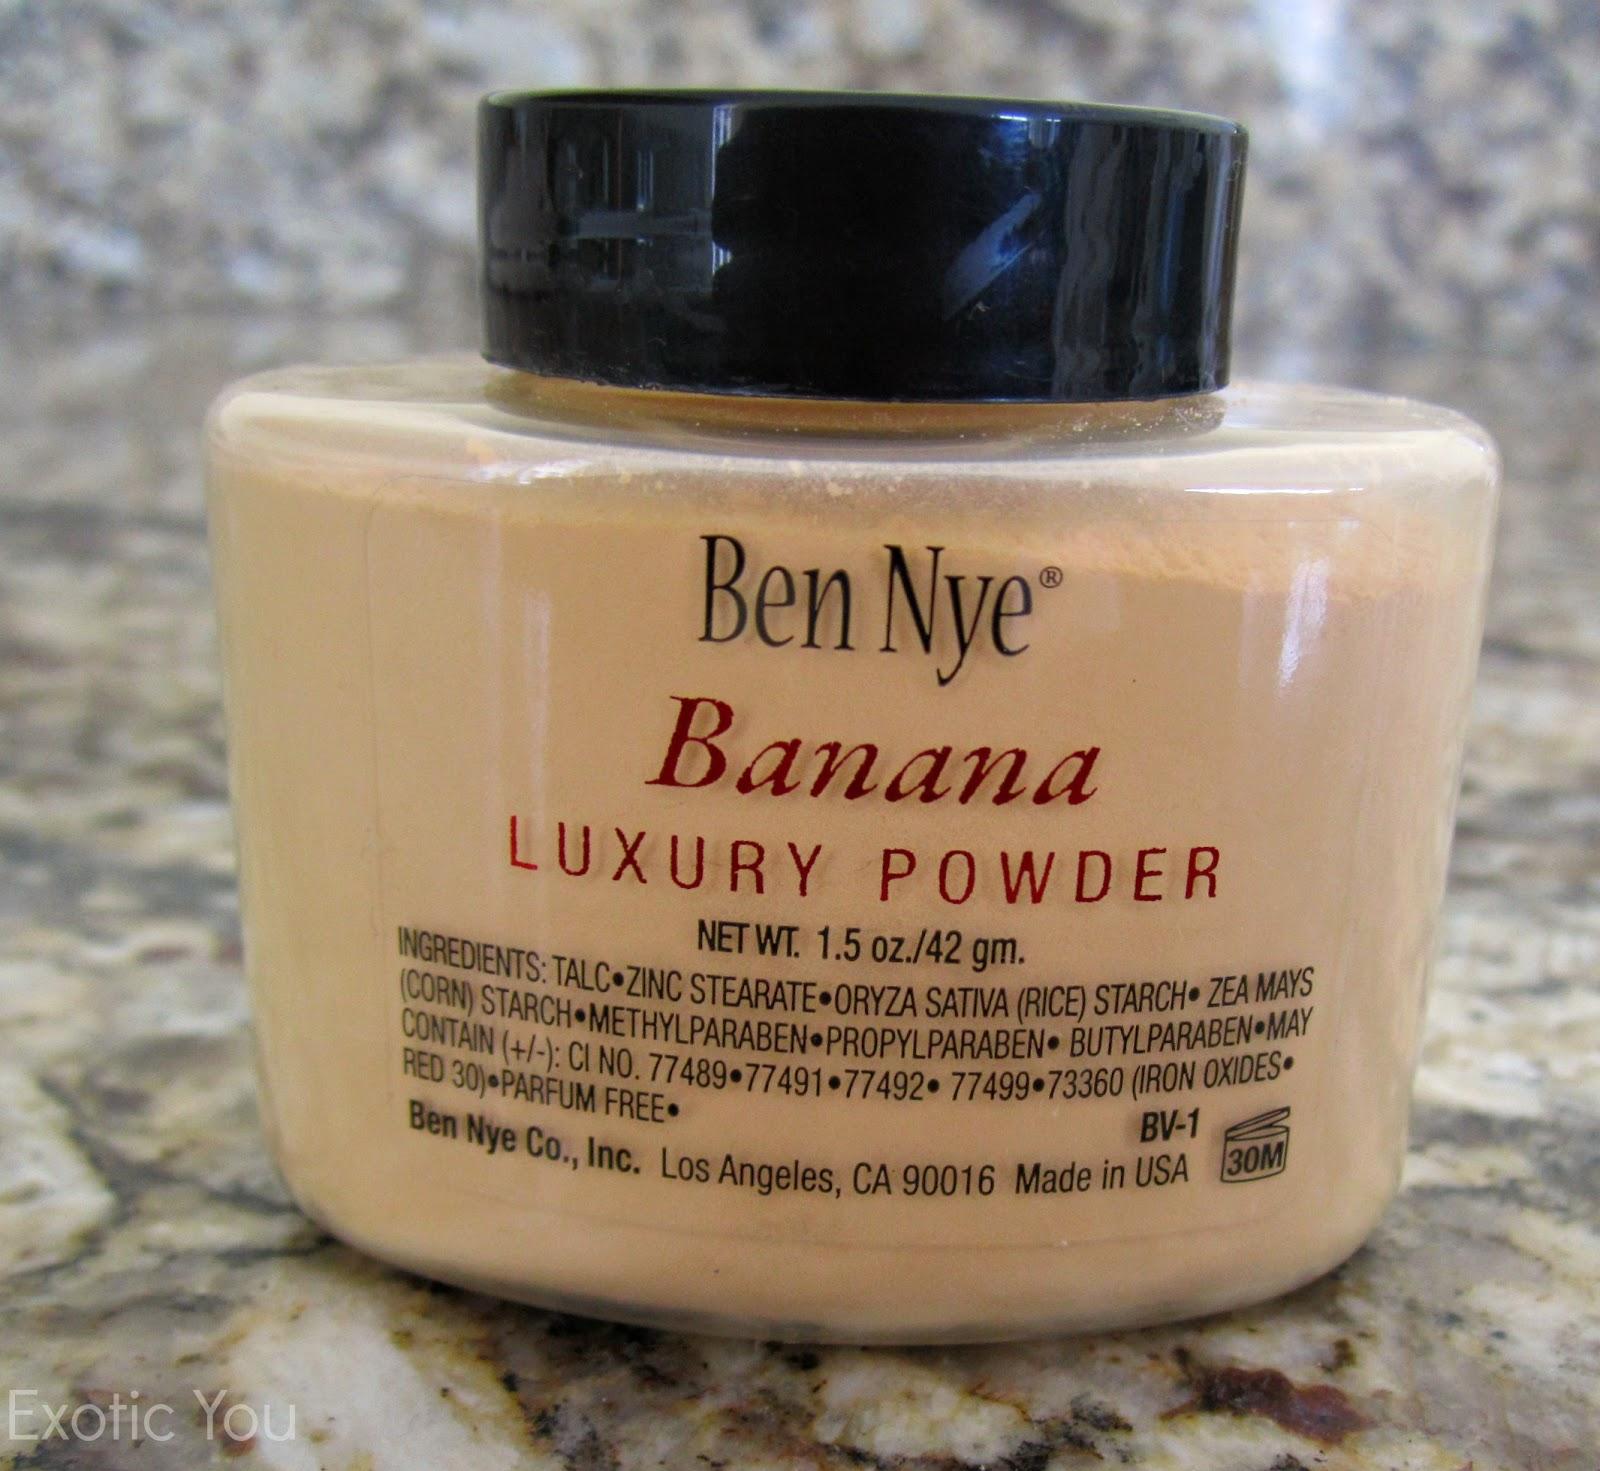 Bannana powder